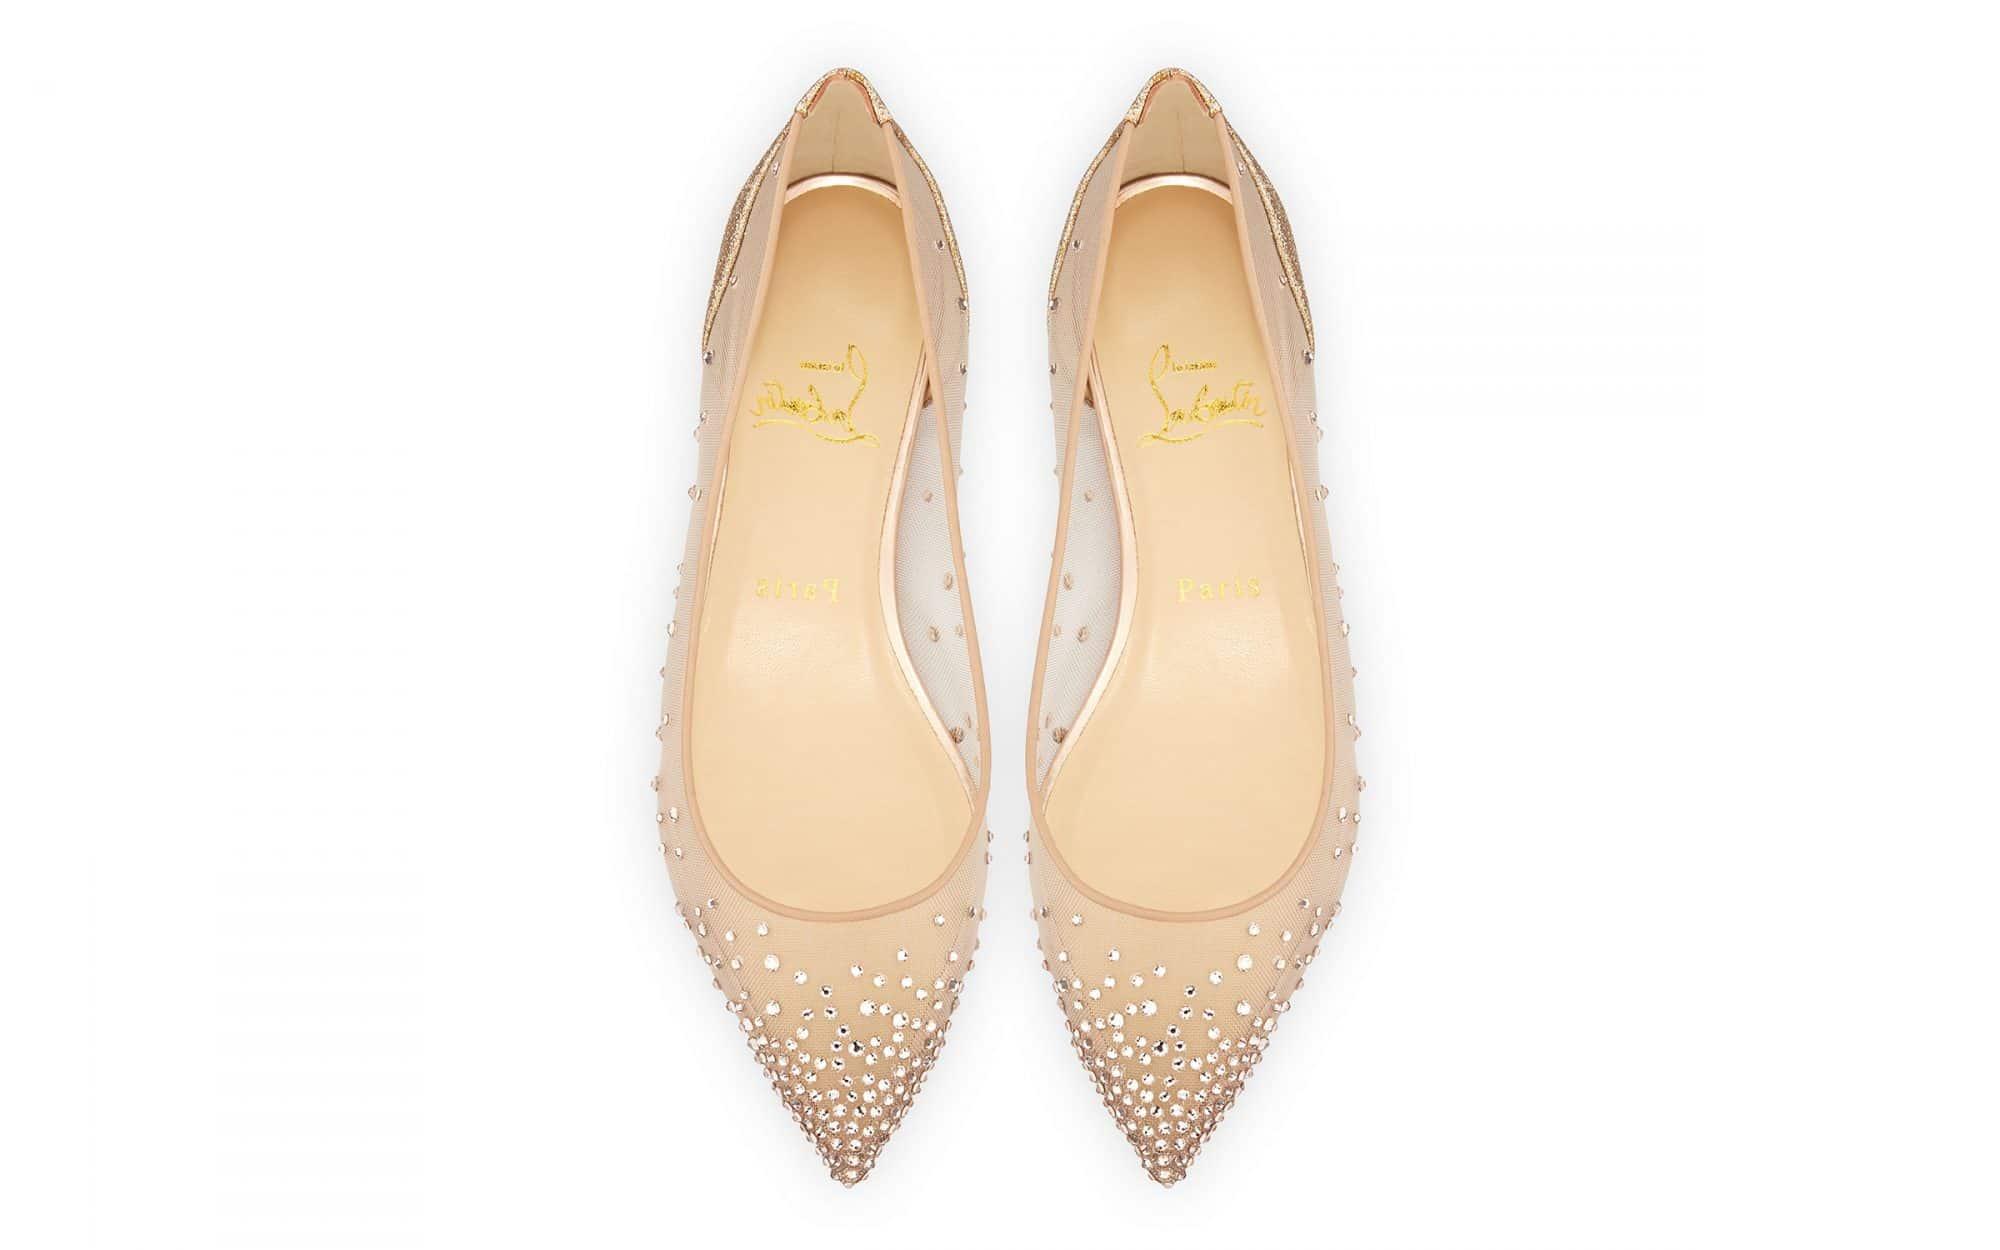 Flat νυφικά παπούτσια Christian Louboutin